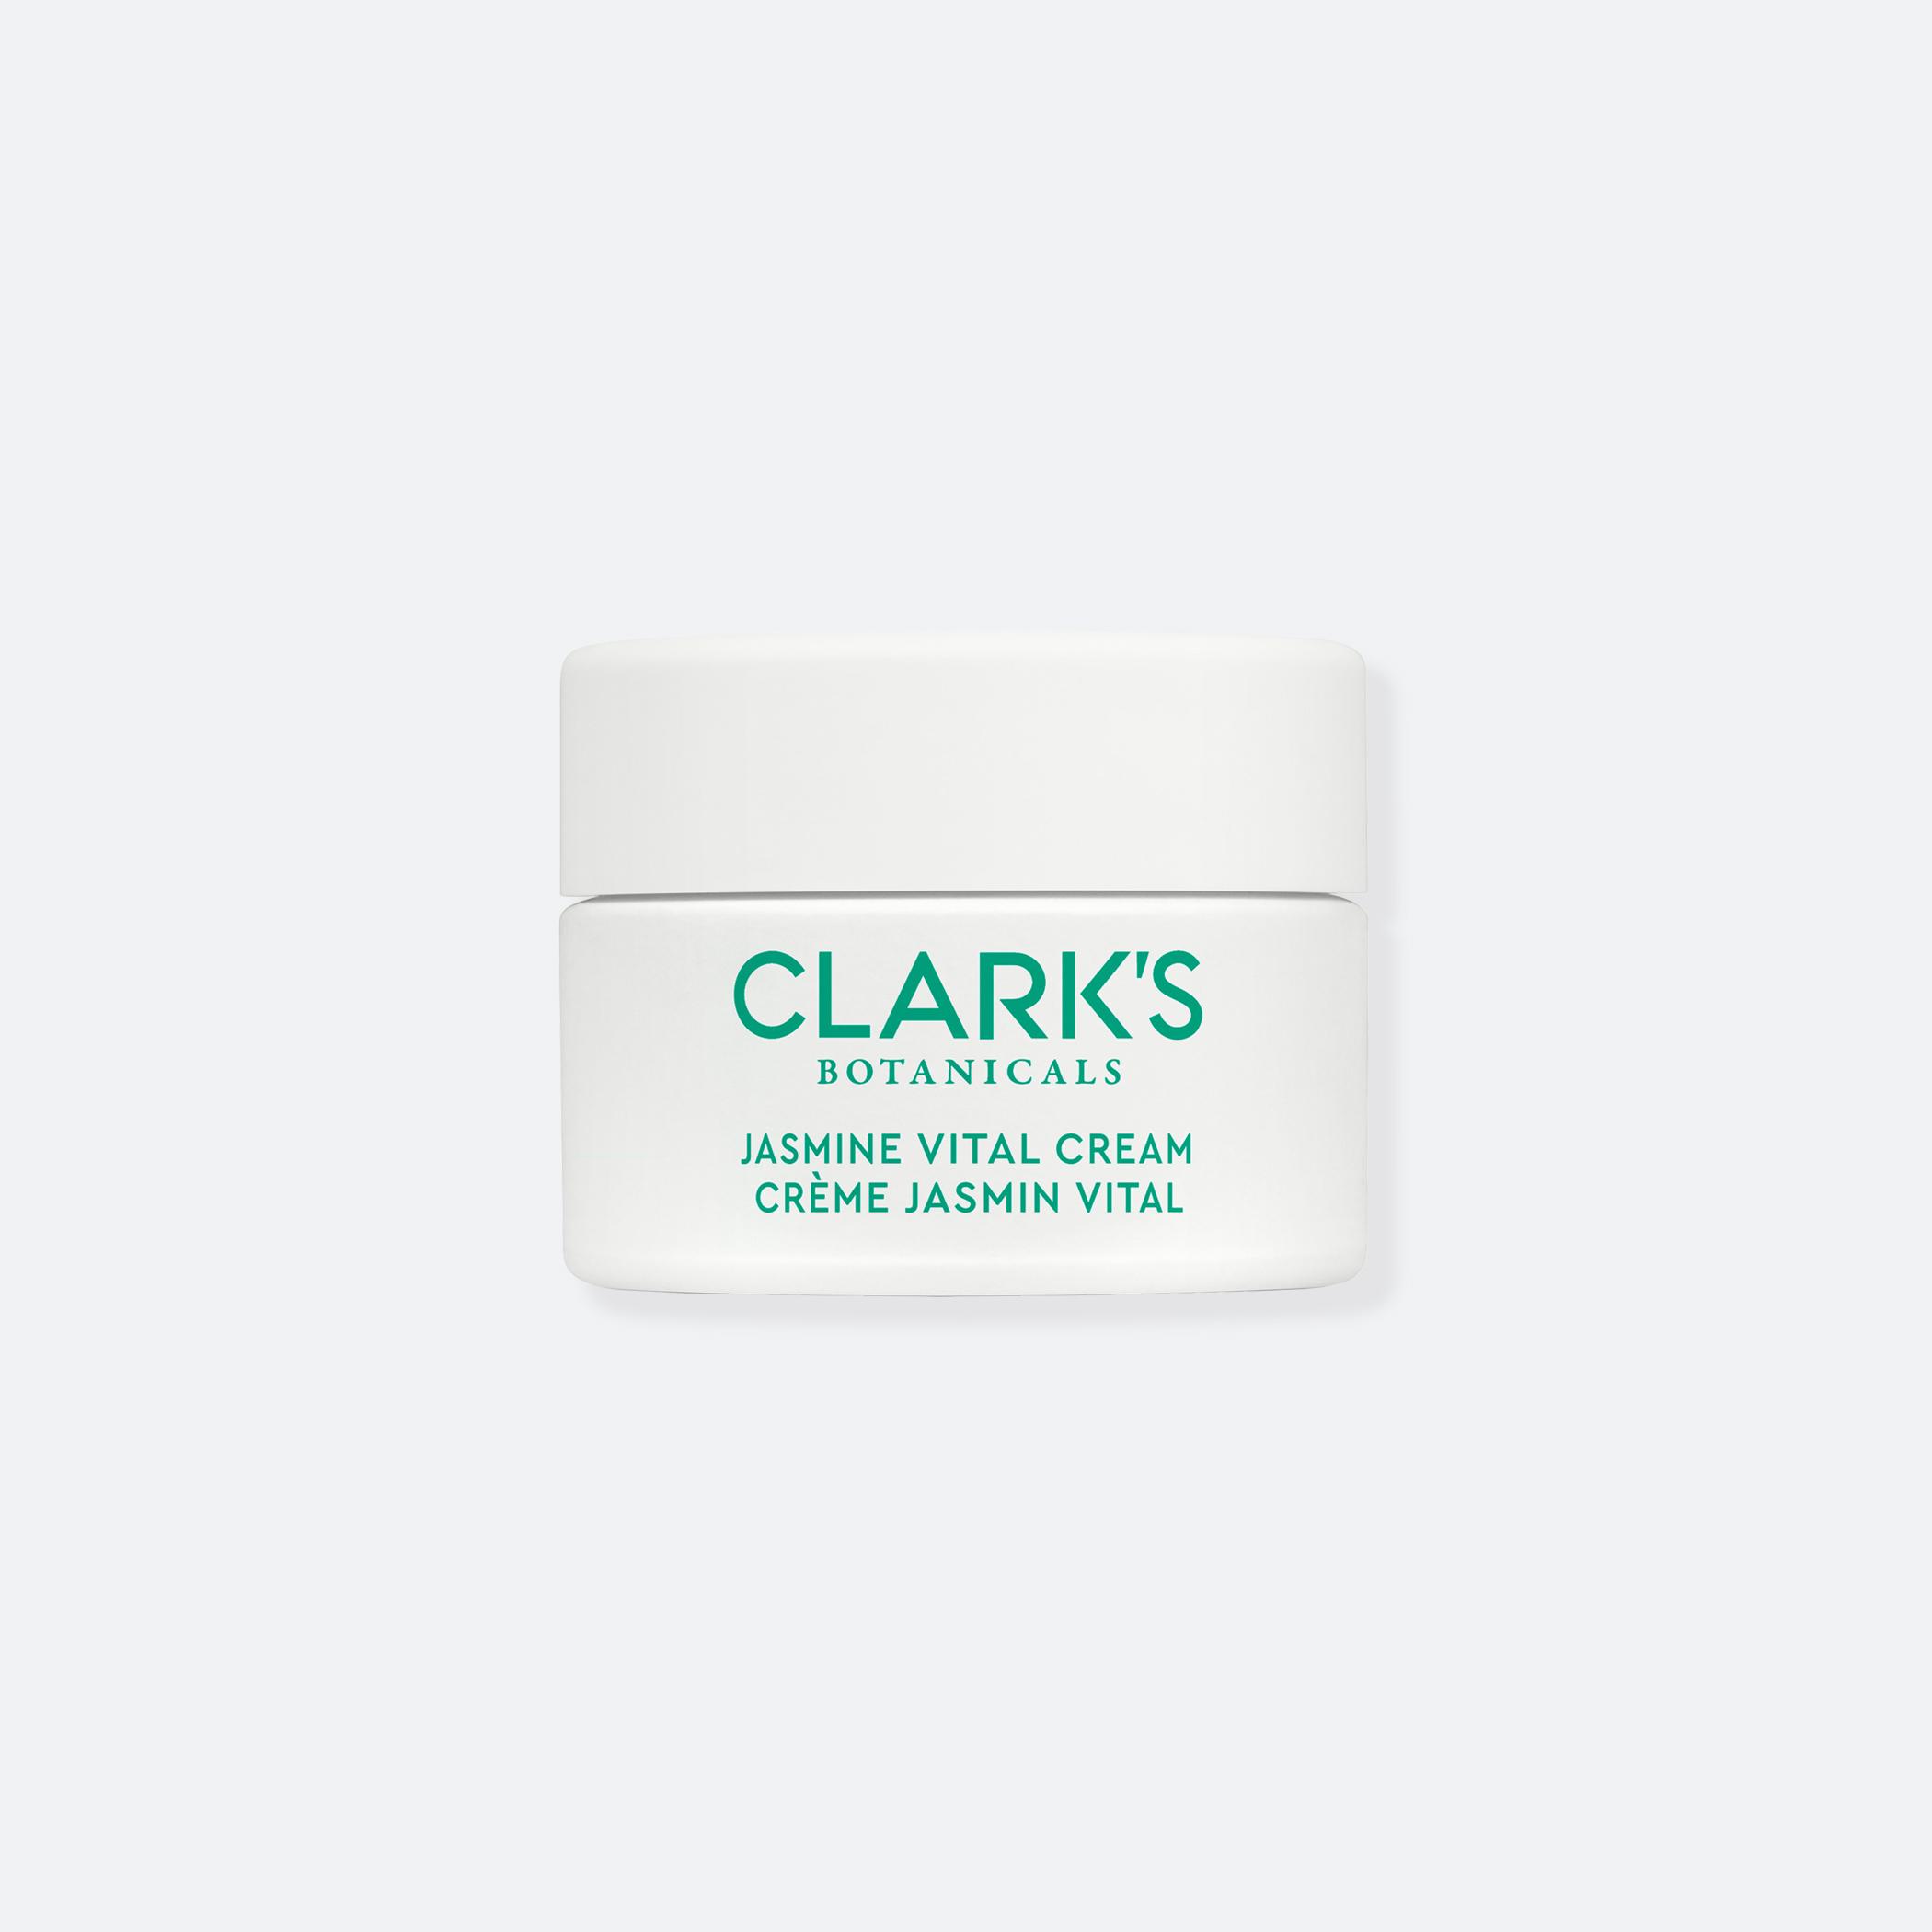 OhMart Clark's Botanicals Jasmine Vital Cream 2